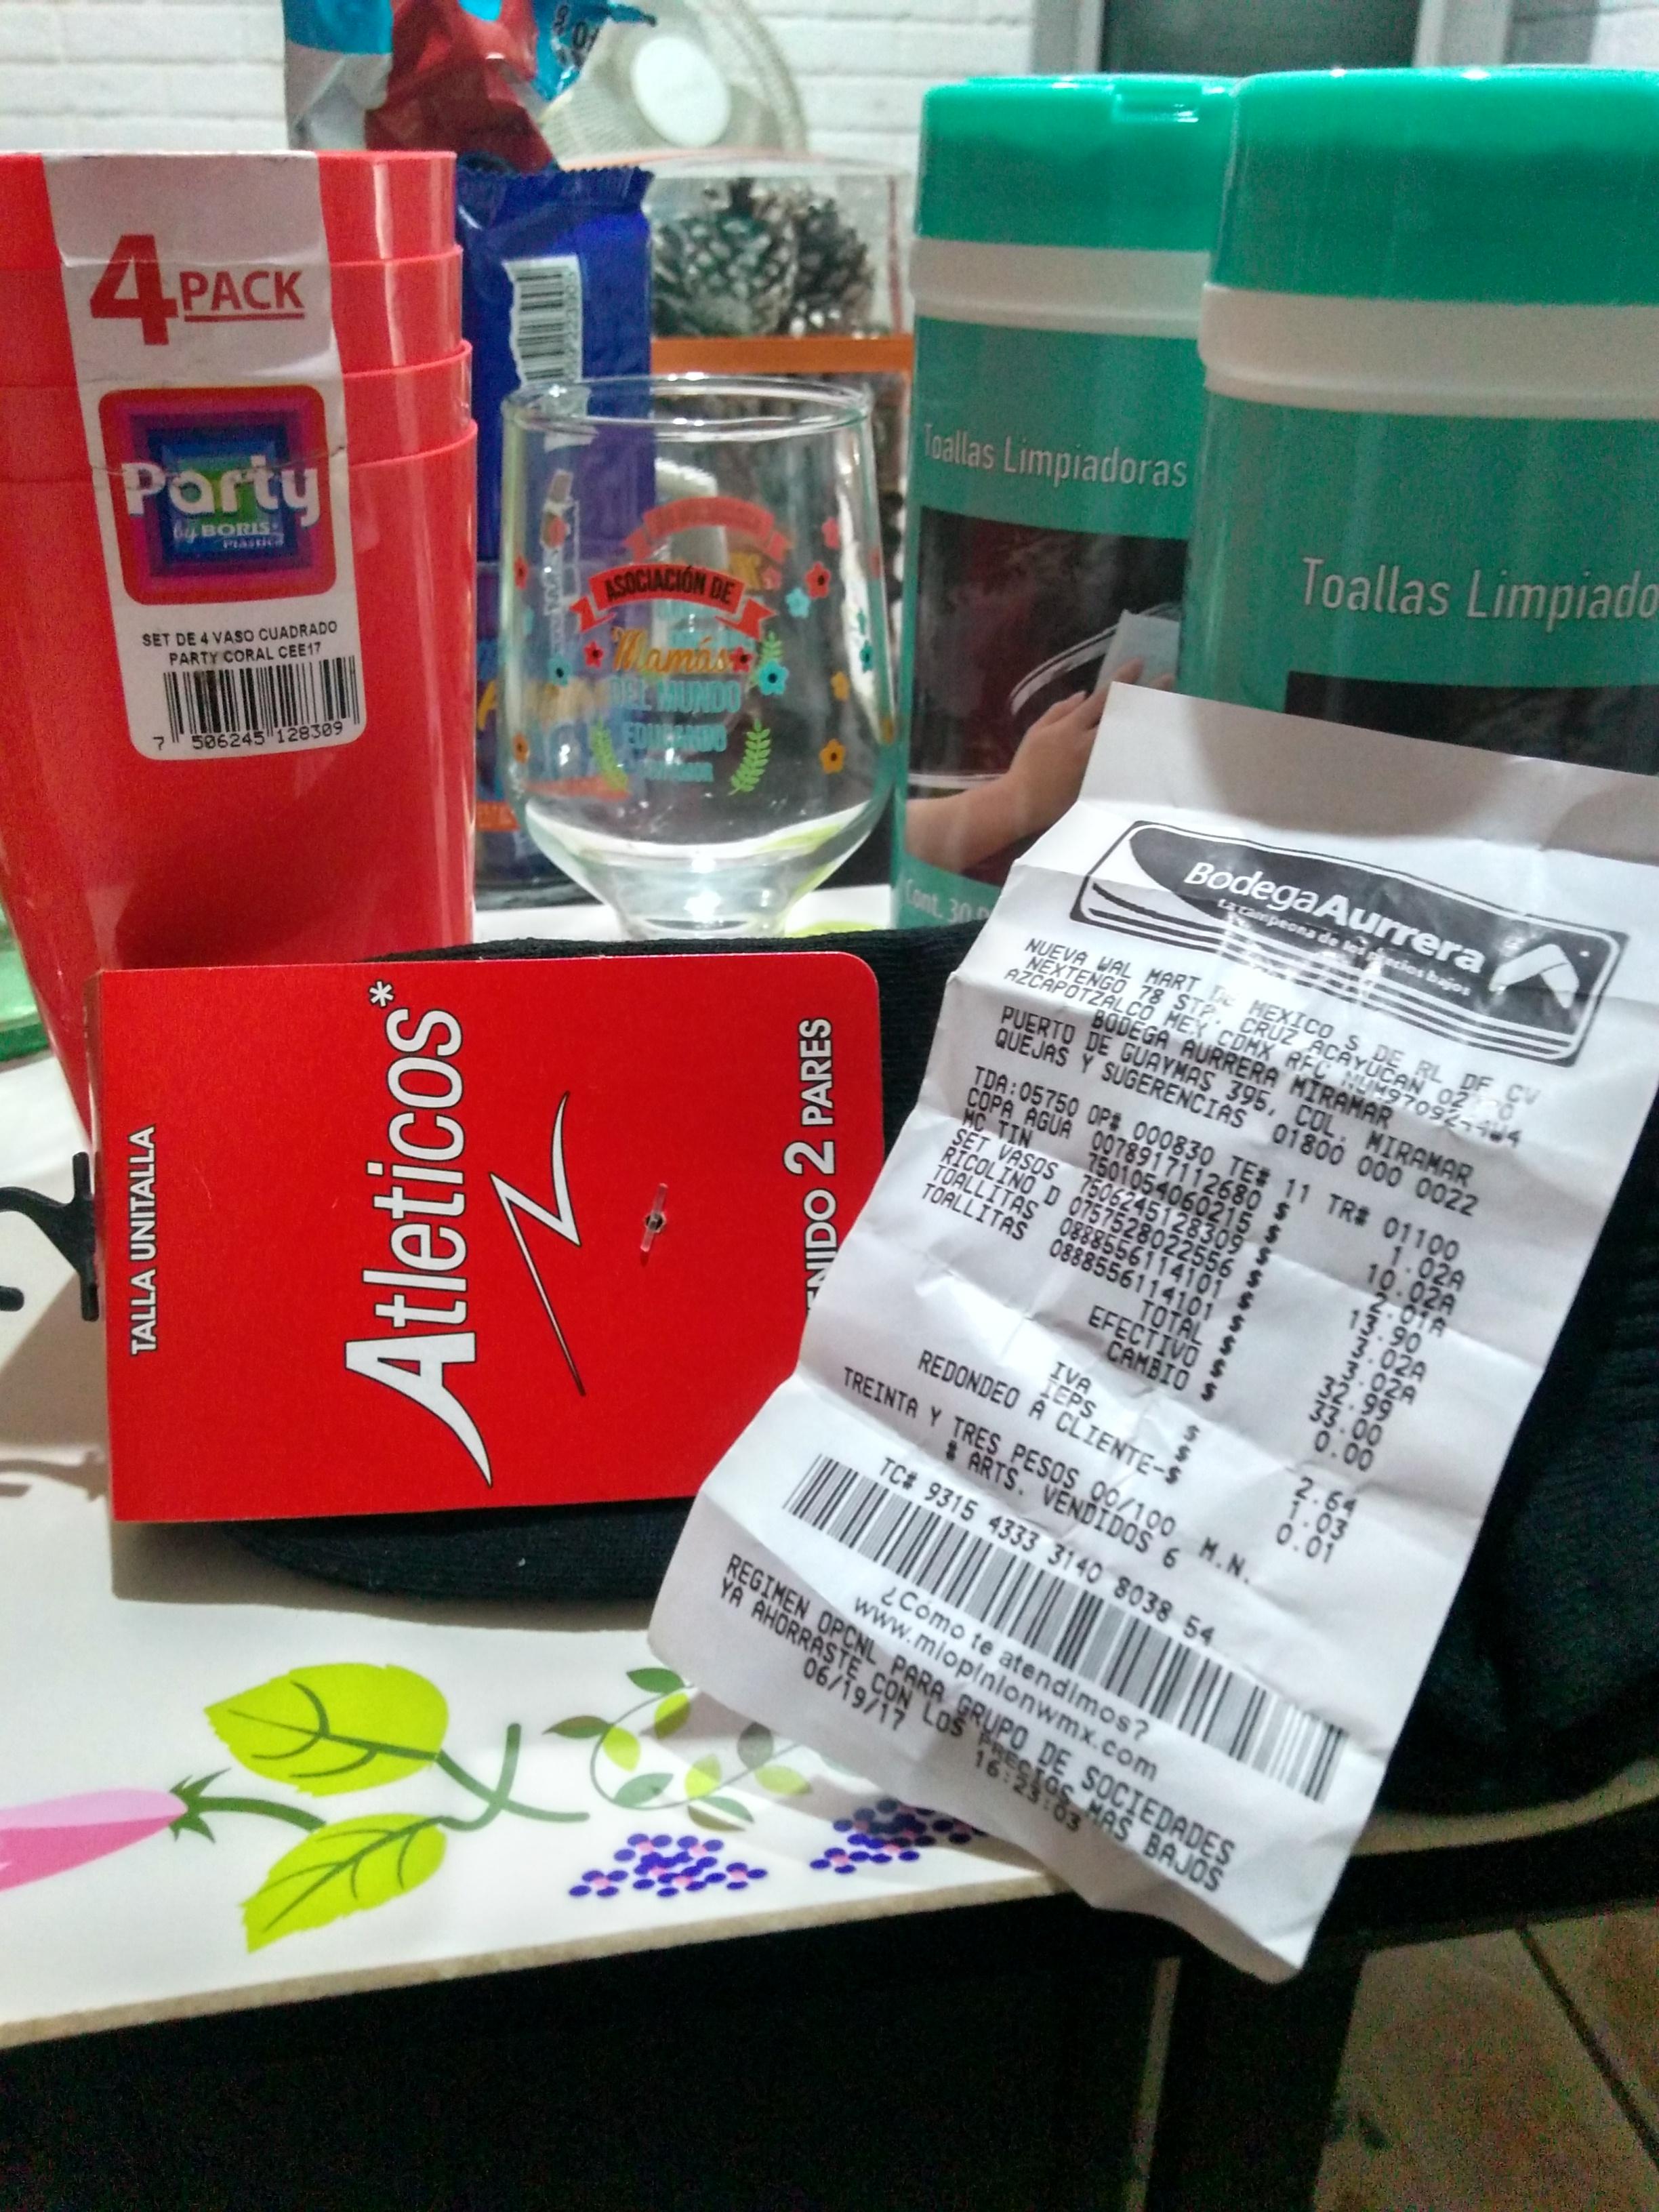 Bodega Aurrerá Miramar en Zapopan jalisco: empecemos otra semana de cosa baratita (ej. Set de Vasos a $2.01)